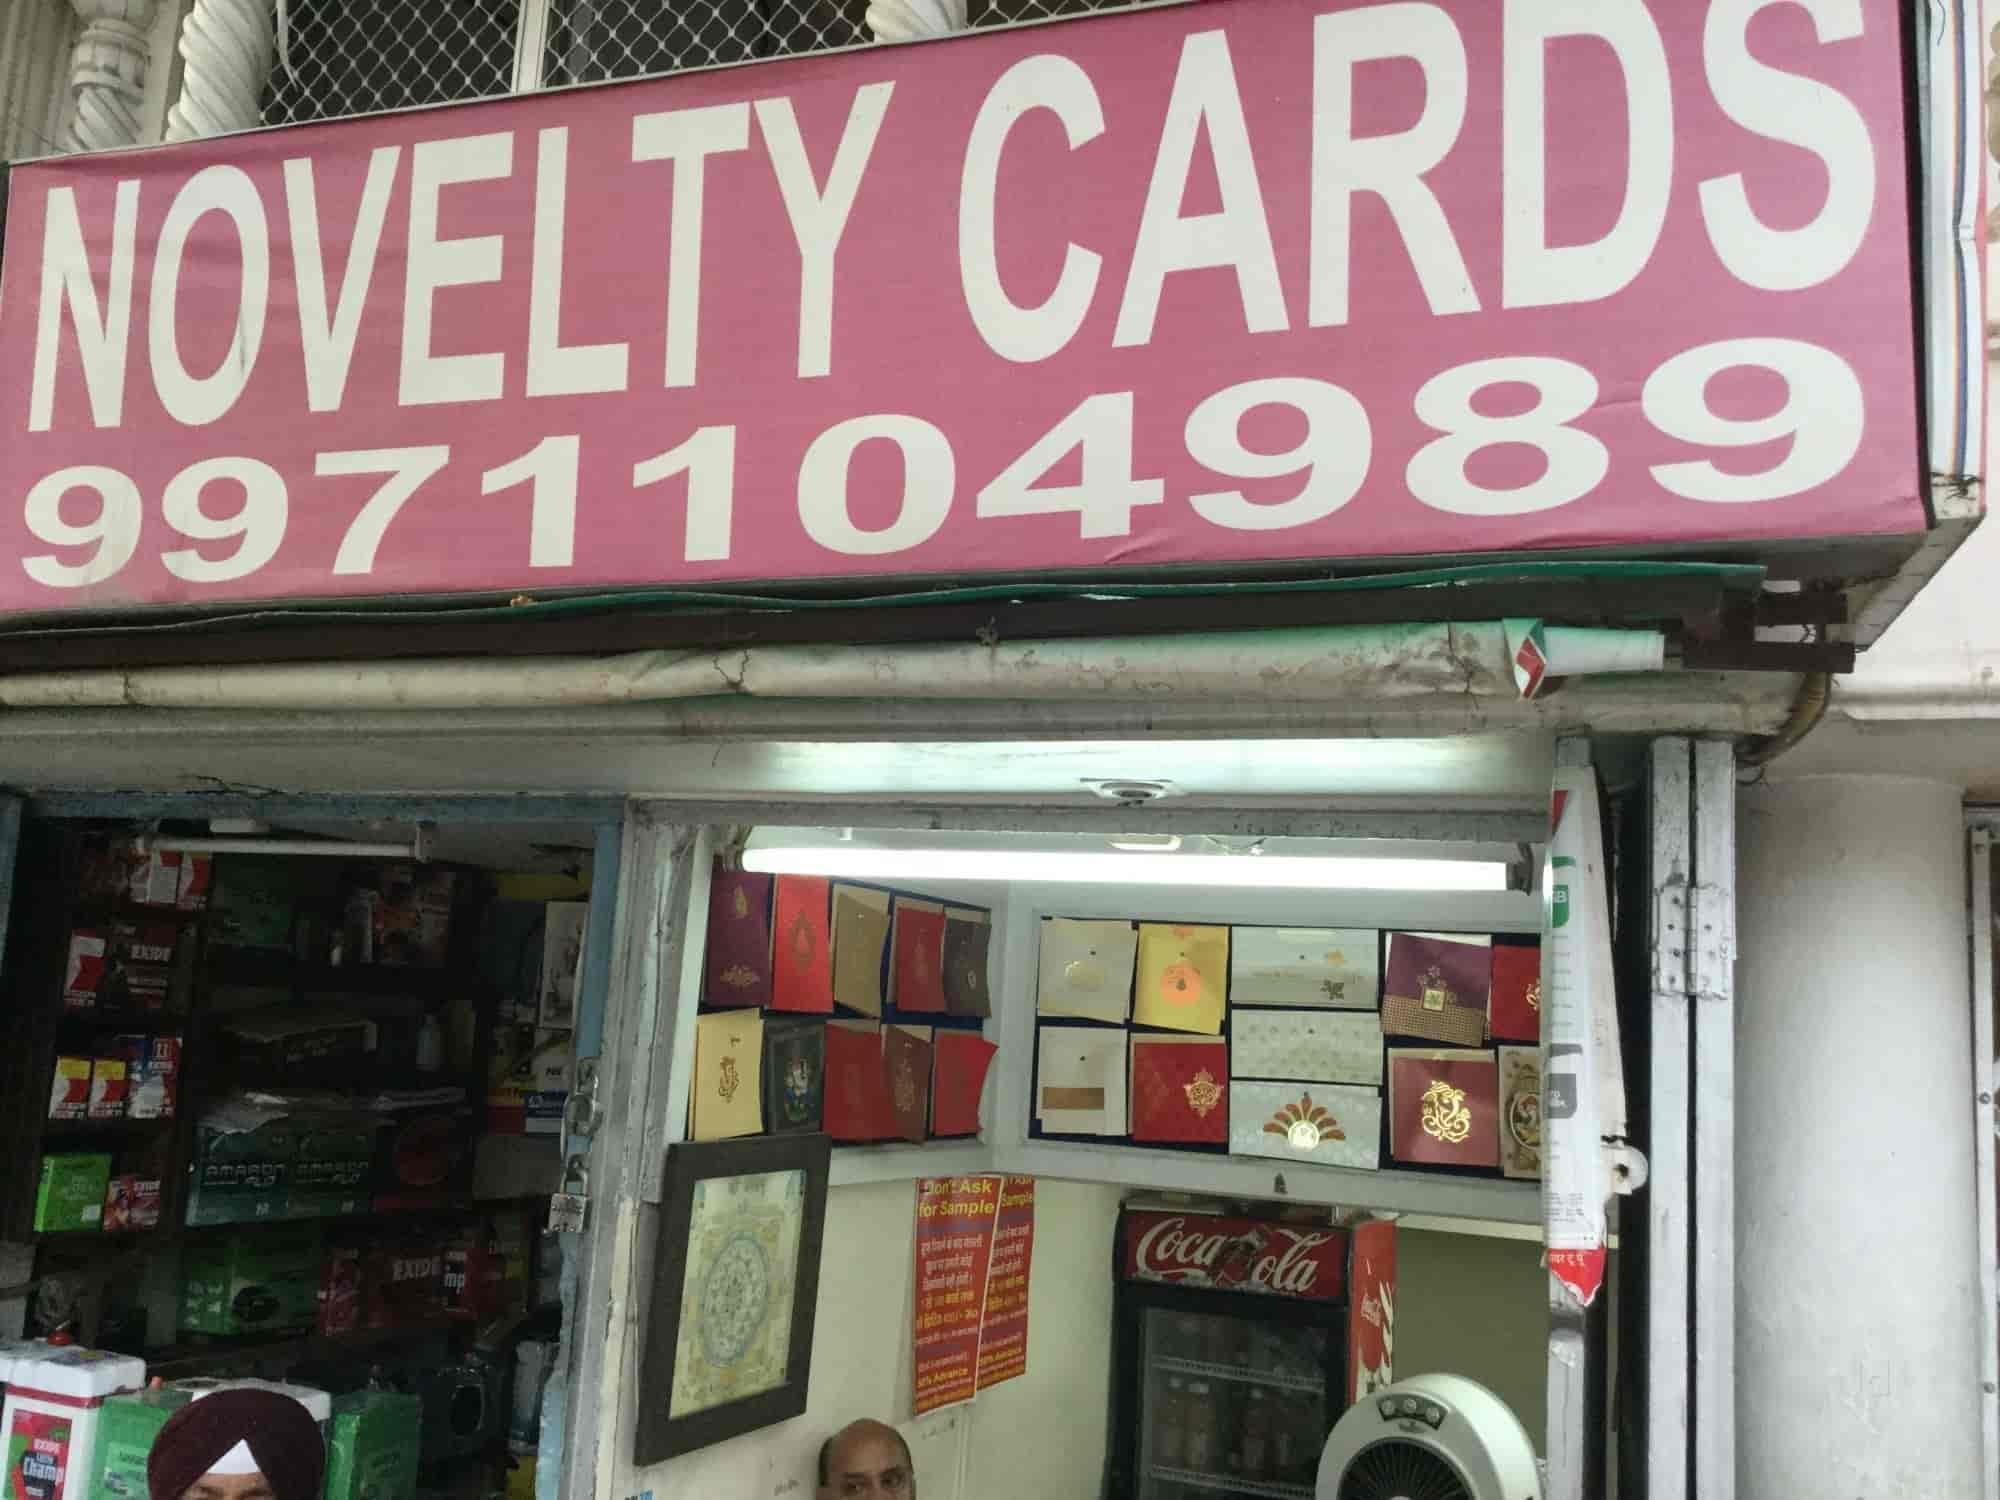 Novelty Cards Photos Malviya Nagar Delhi Pictures Images